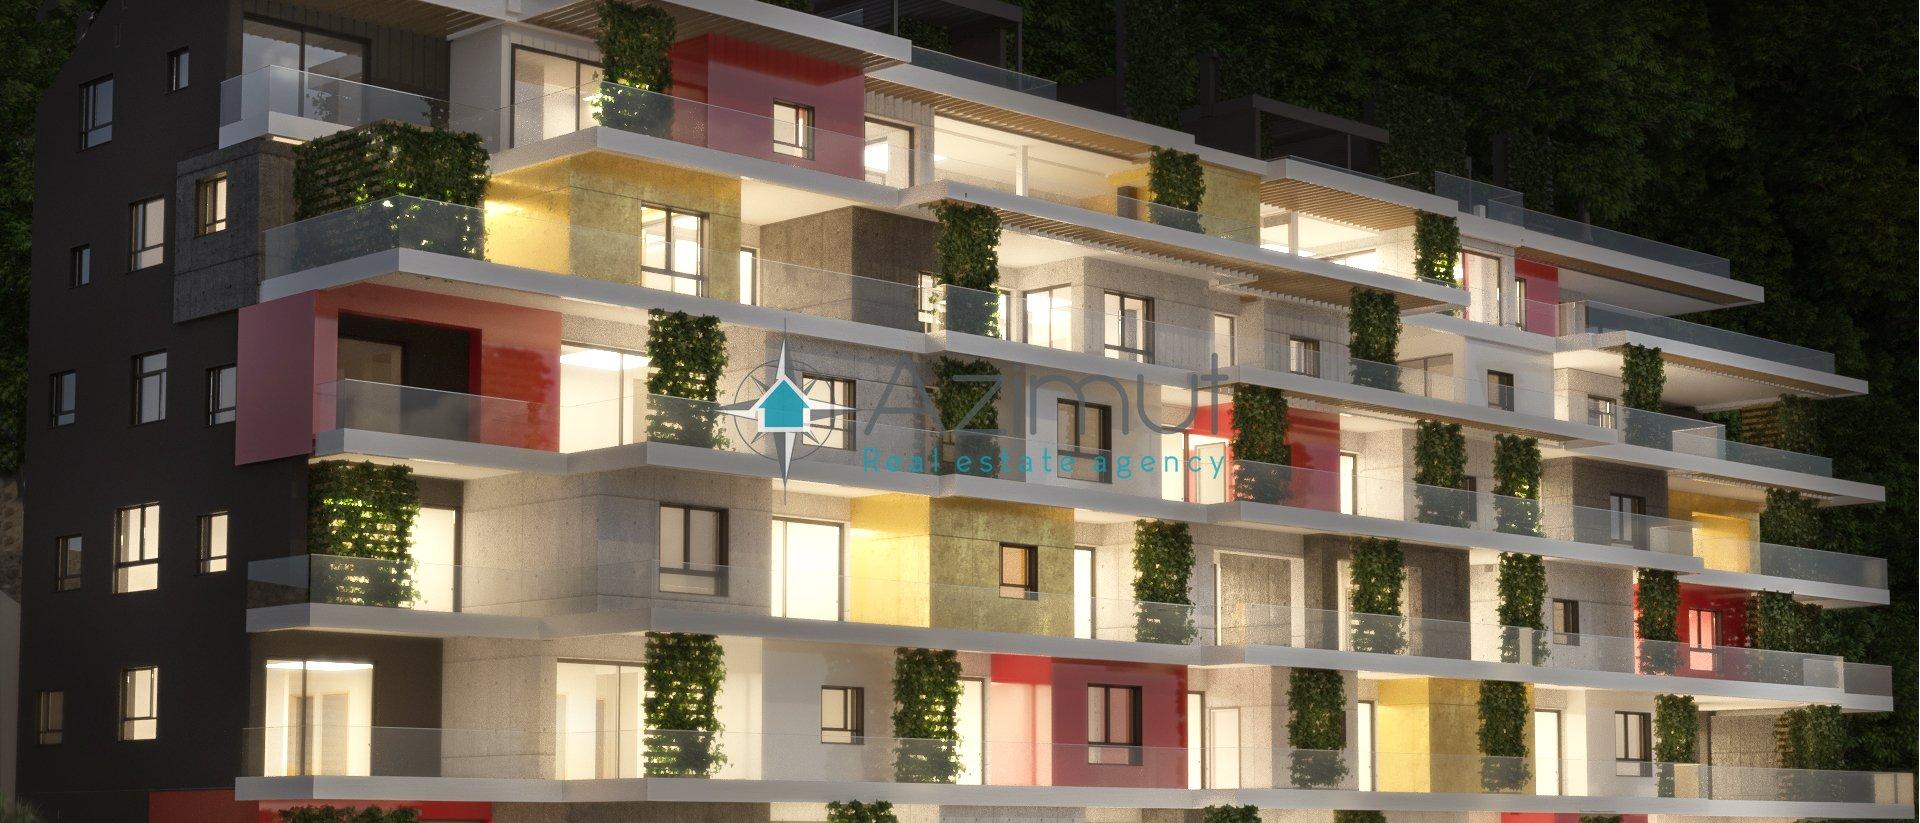 Appartamento, 418 m2, Vendita, Opatija